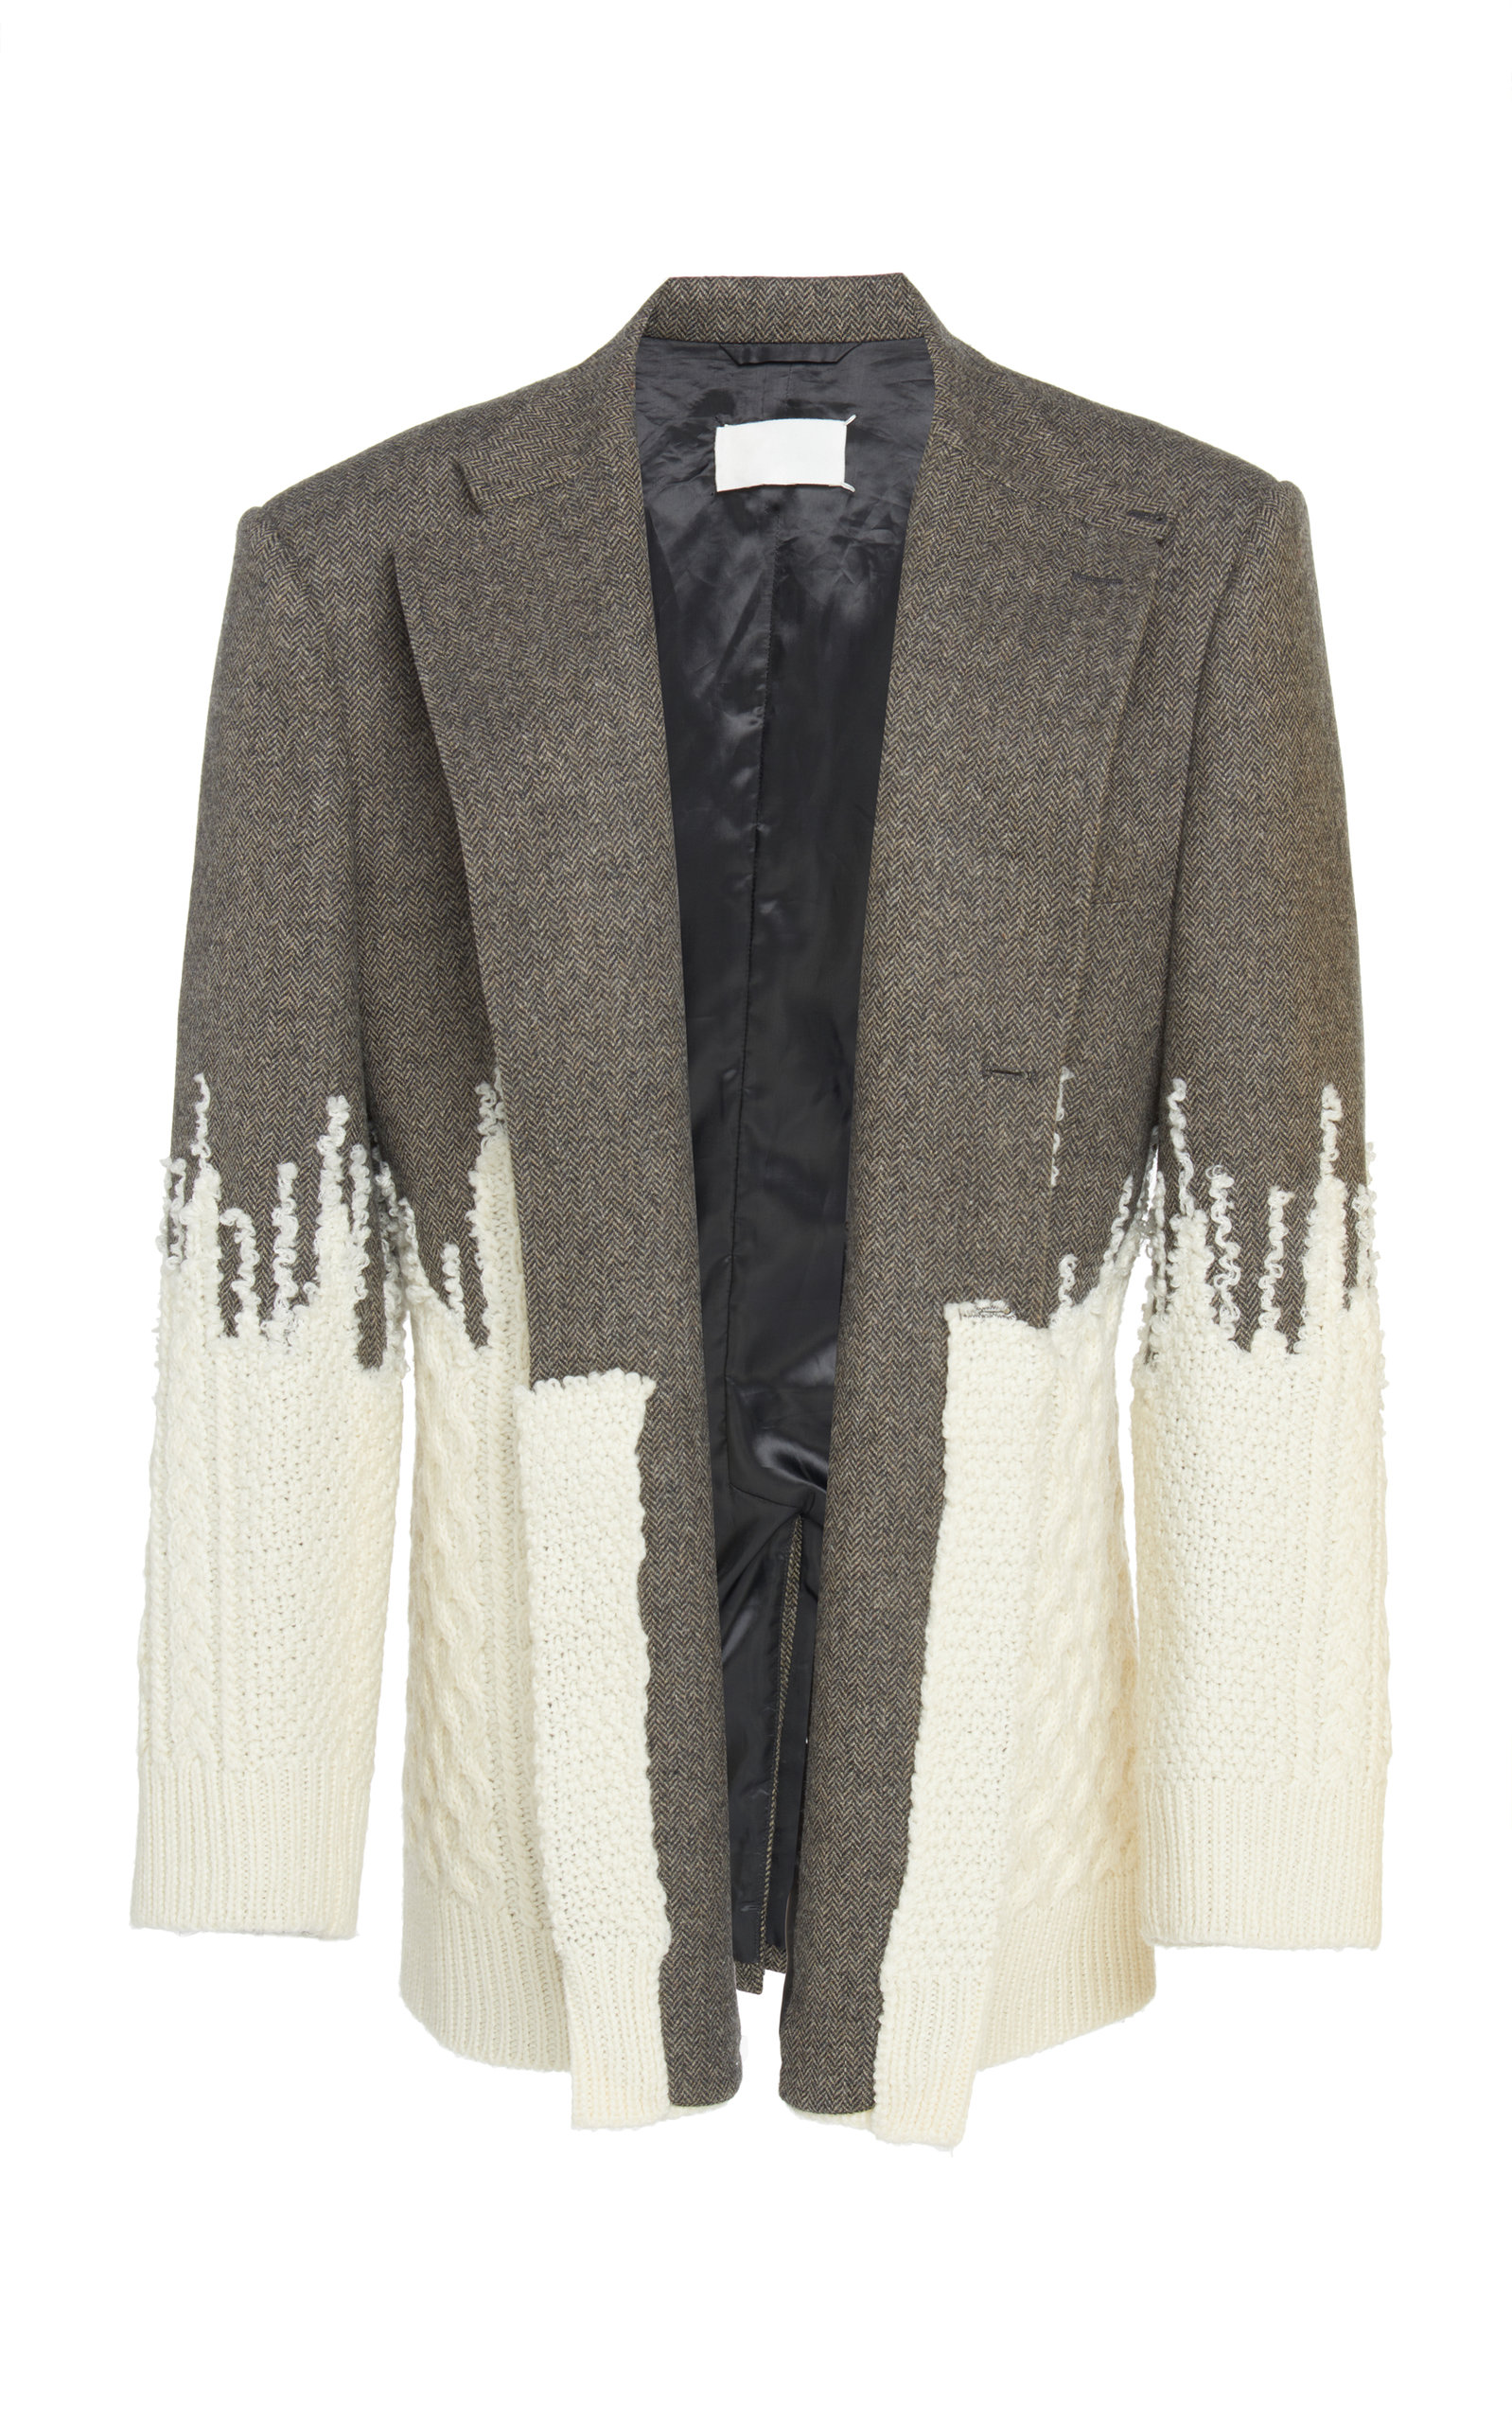 aaaff4d6d2b Maison MargielaHerringbone Degrade Knit Jacket. CLOSE. Loading